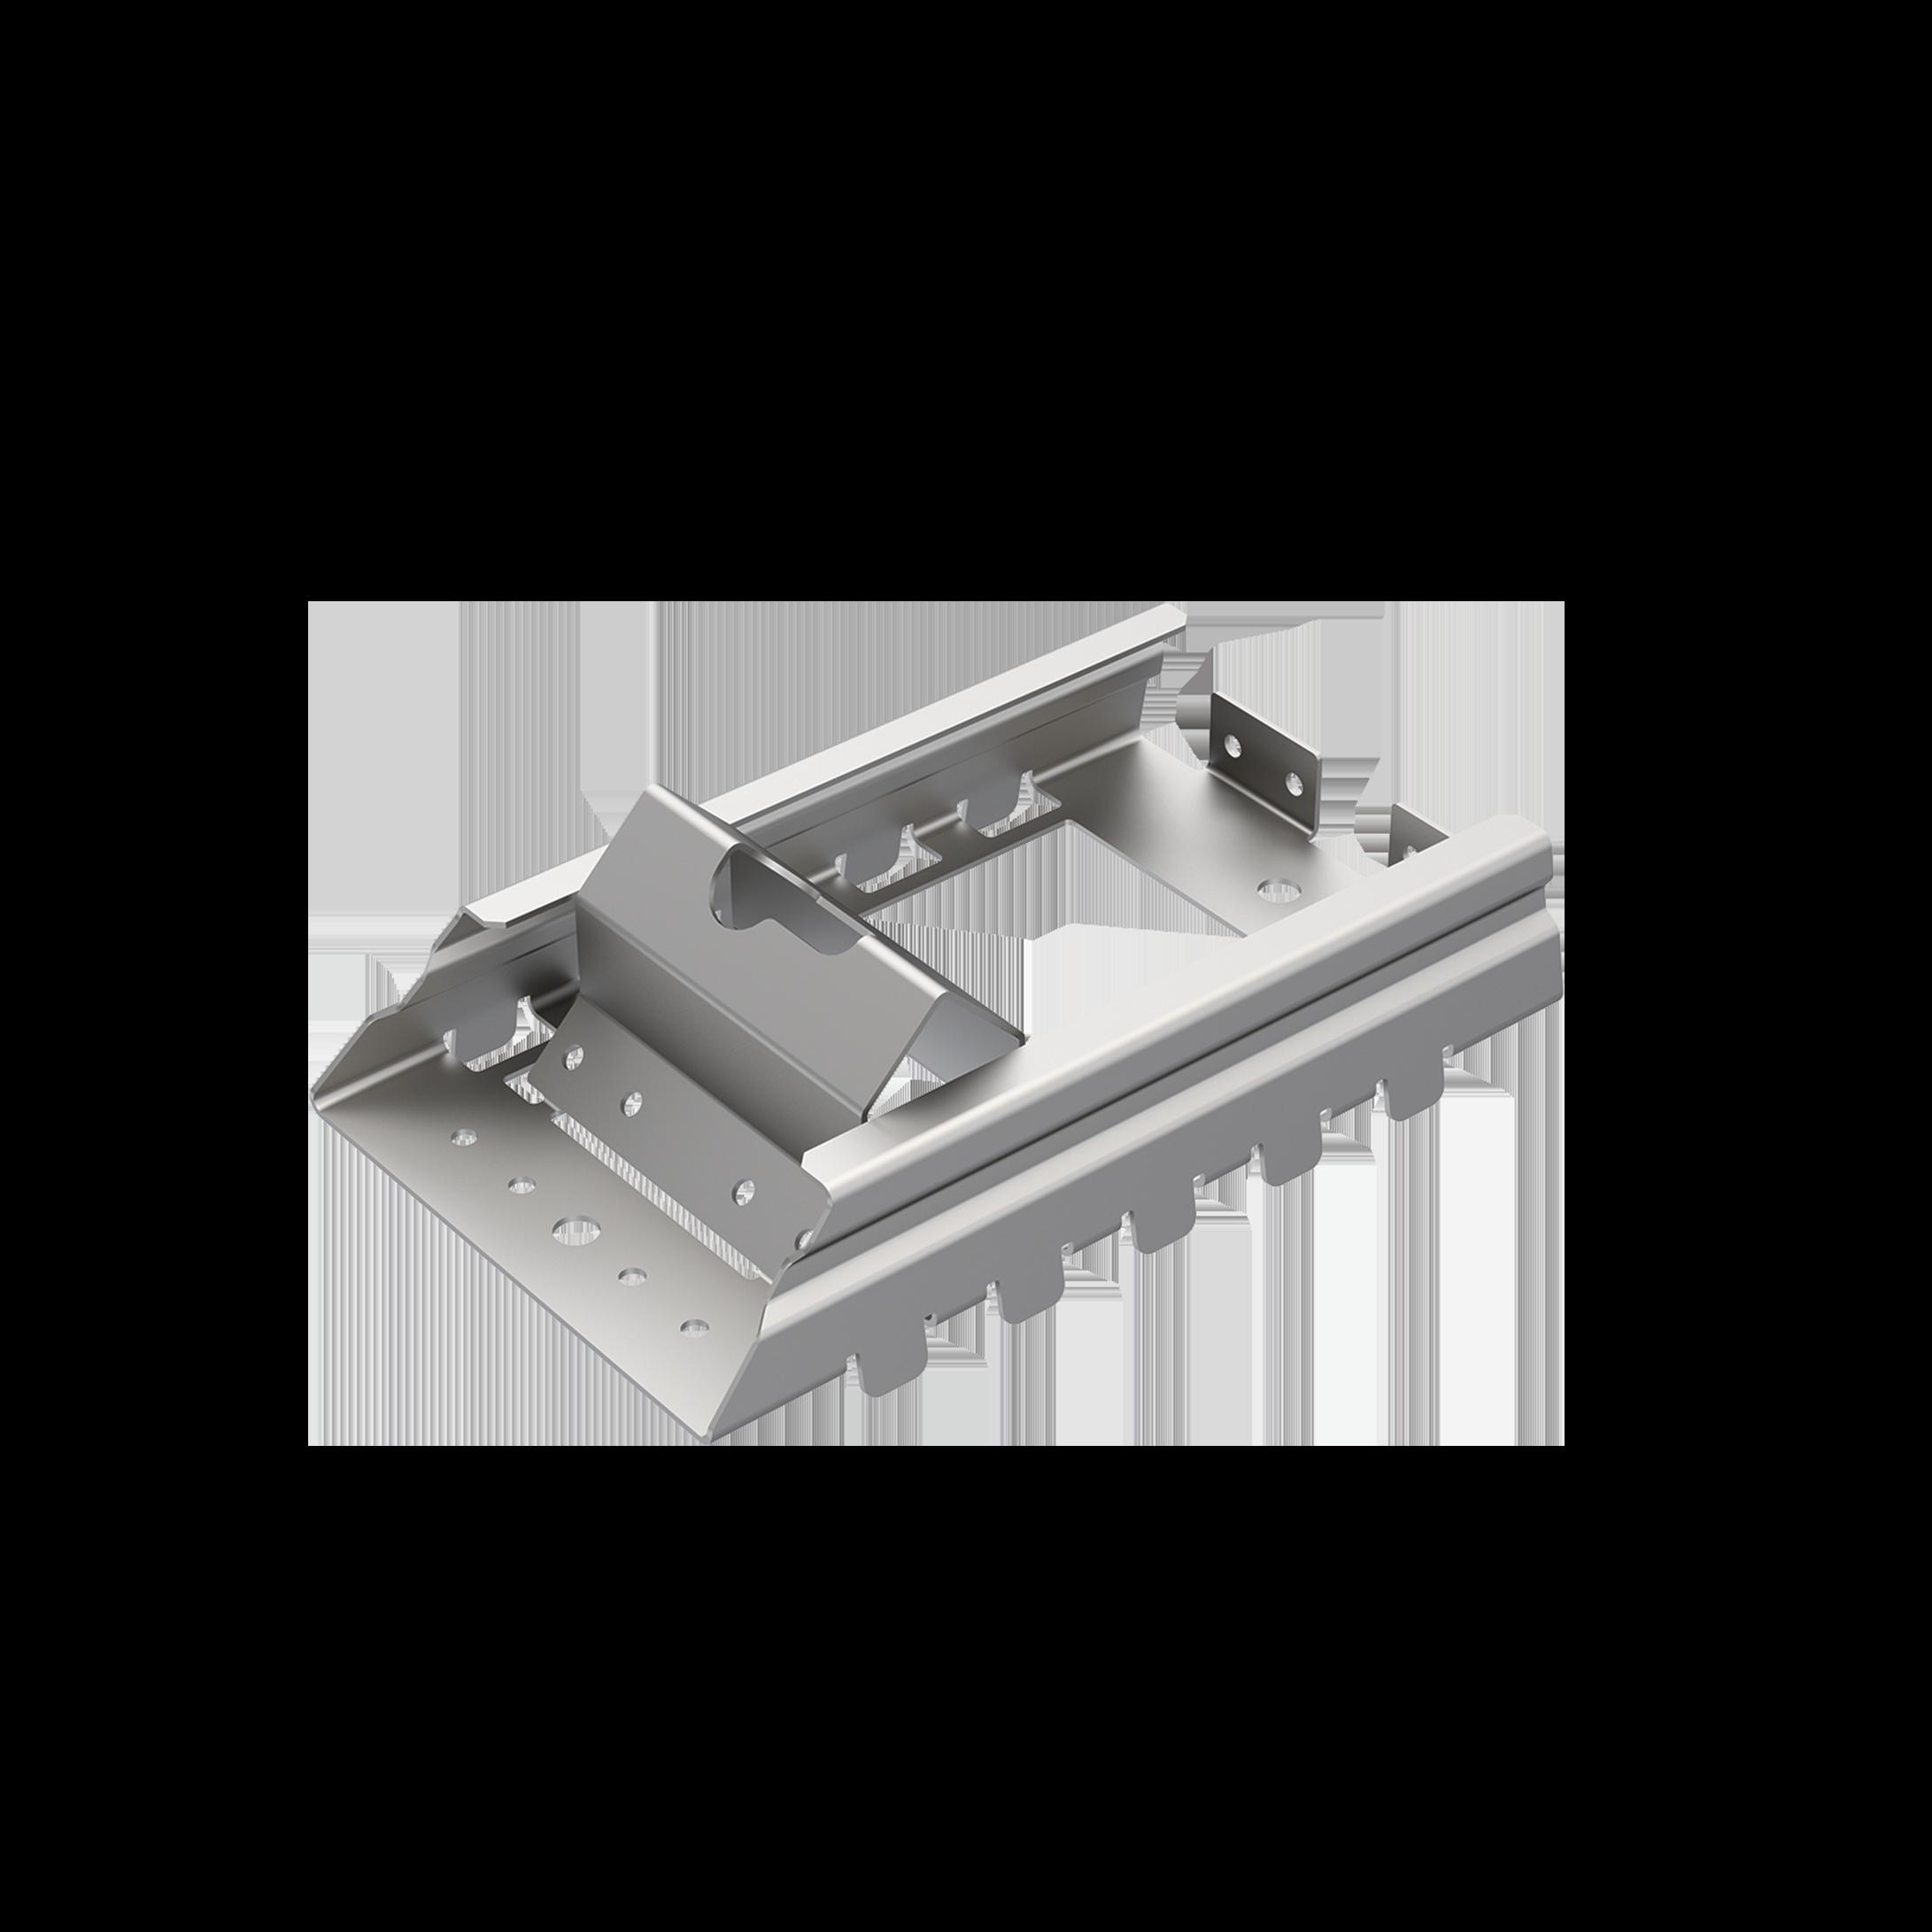 Profile connector